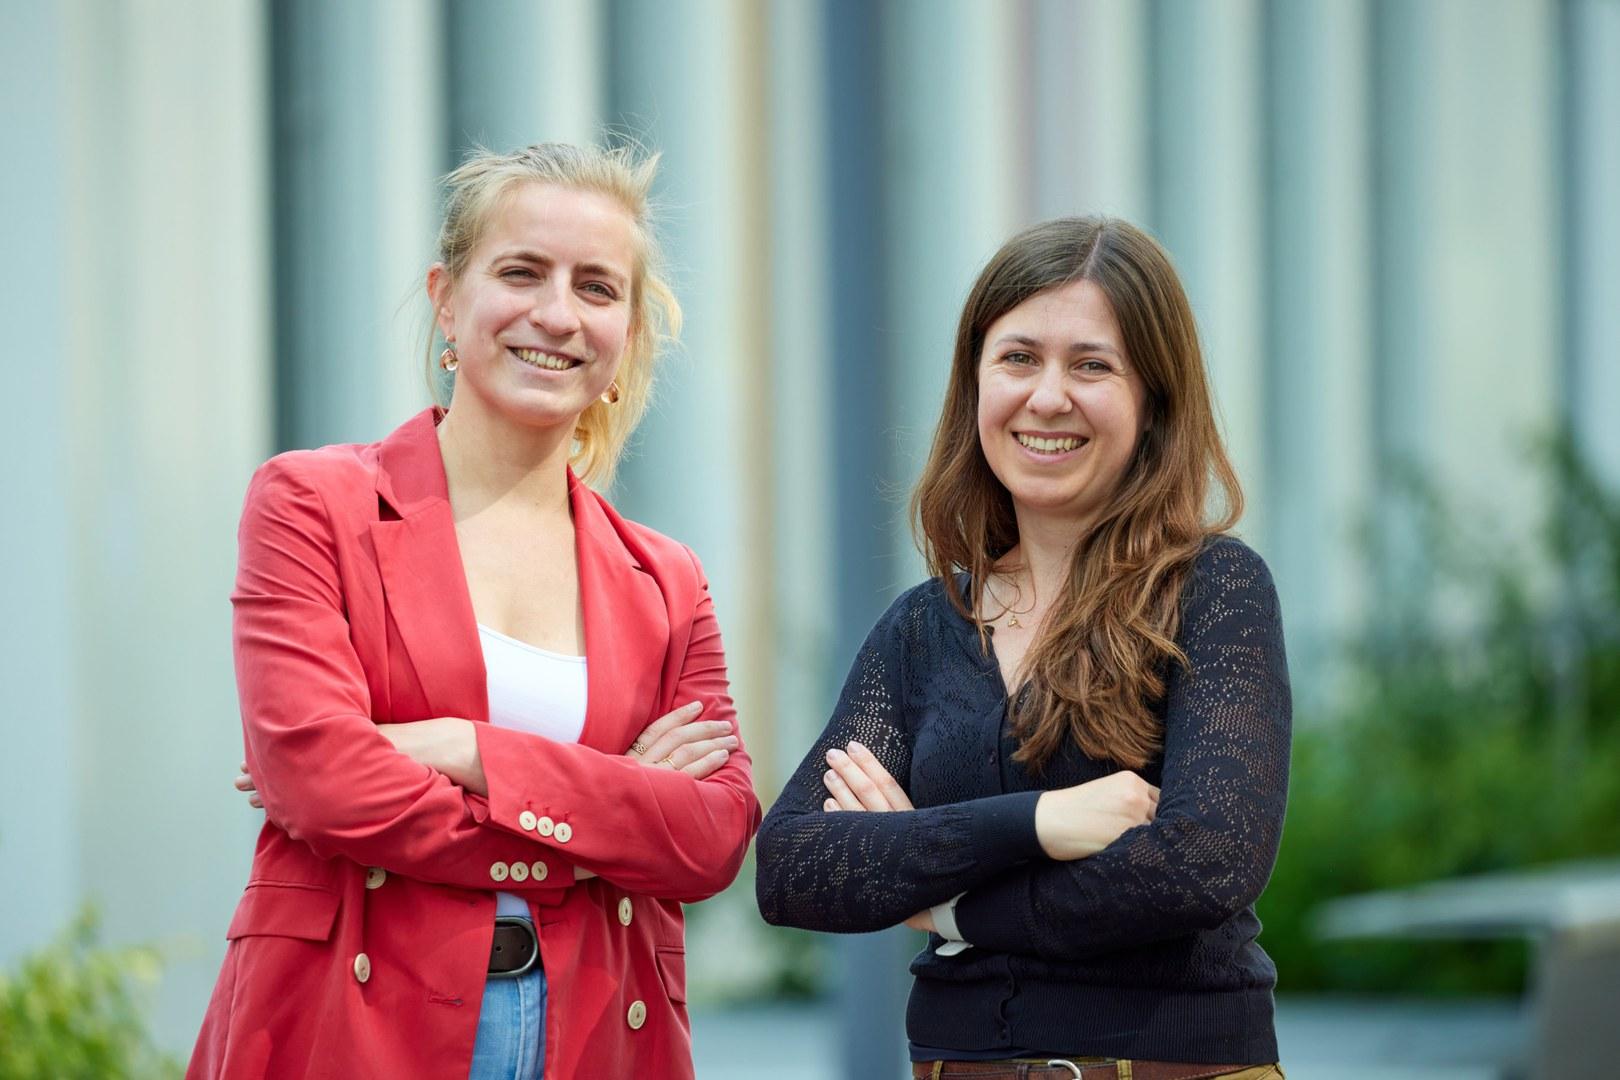 The two new Argelander professors